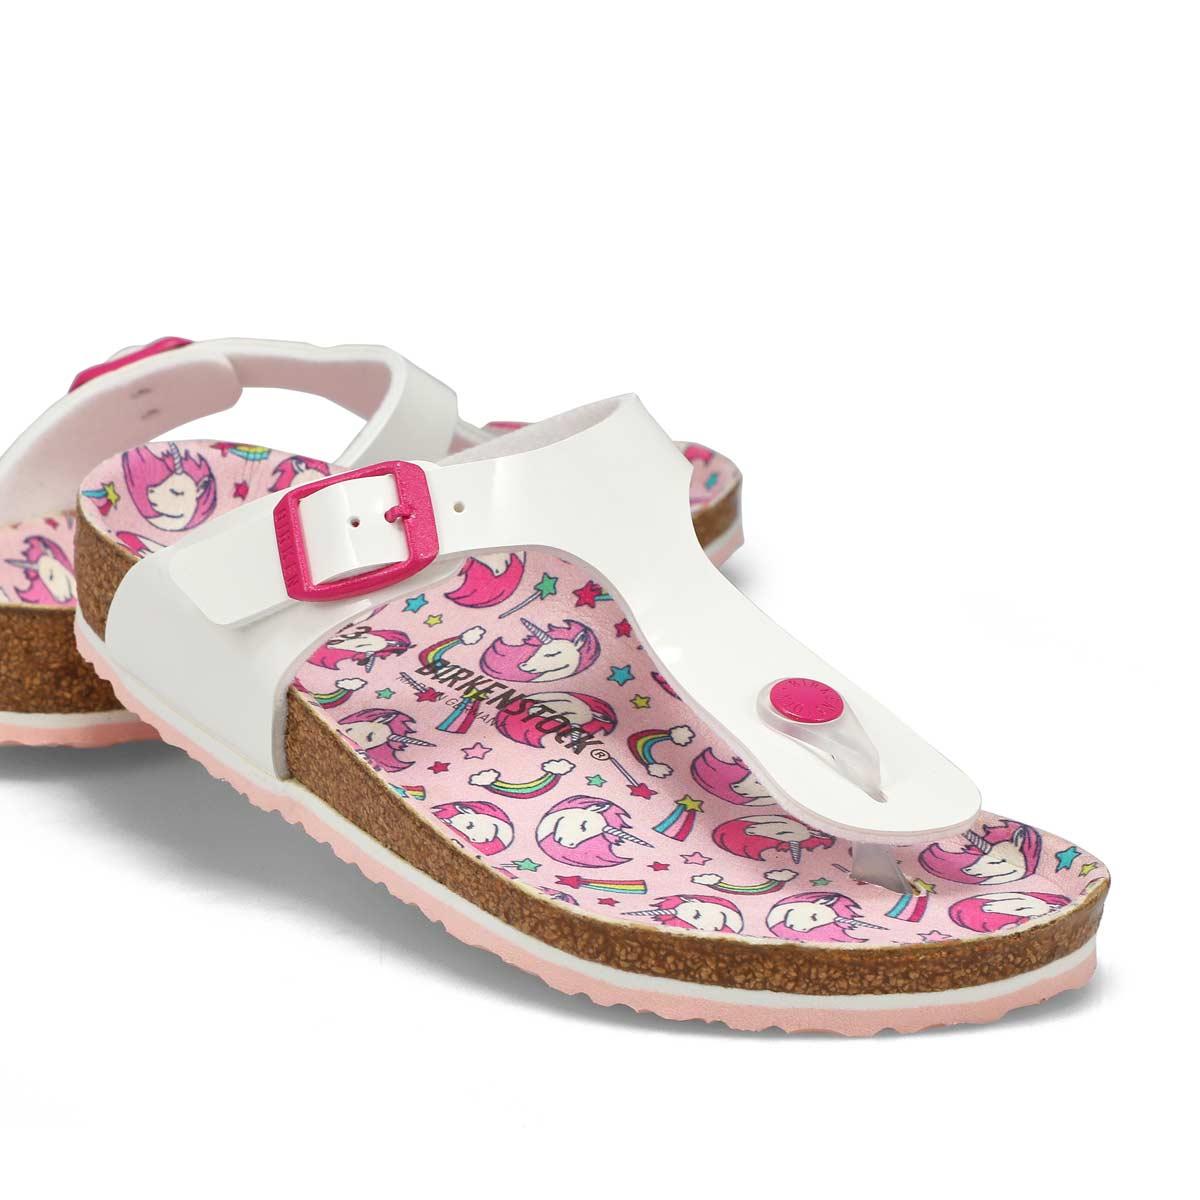 Girls' Gizeh BF Sandals Narrow - Unicorn White Pat